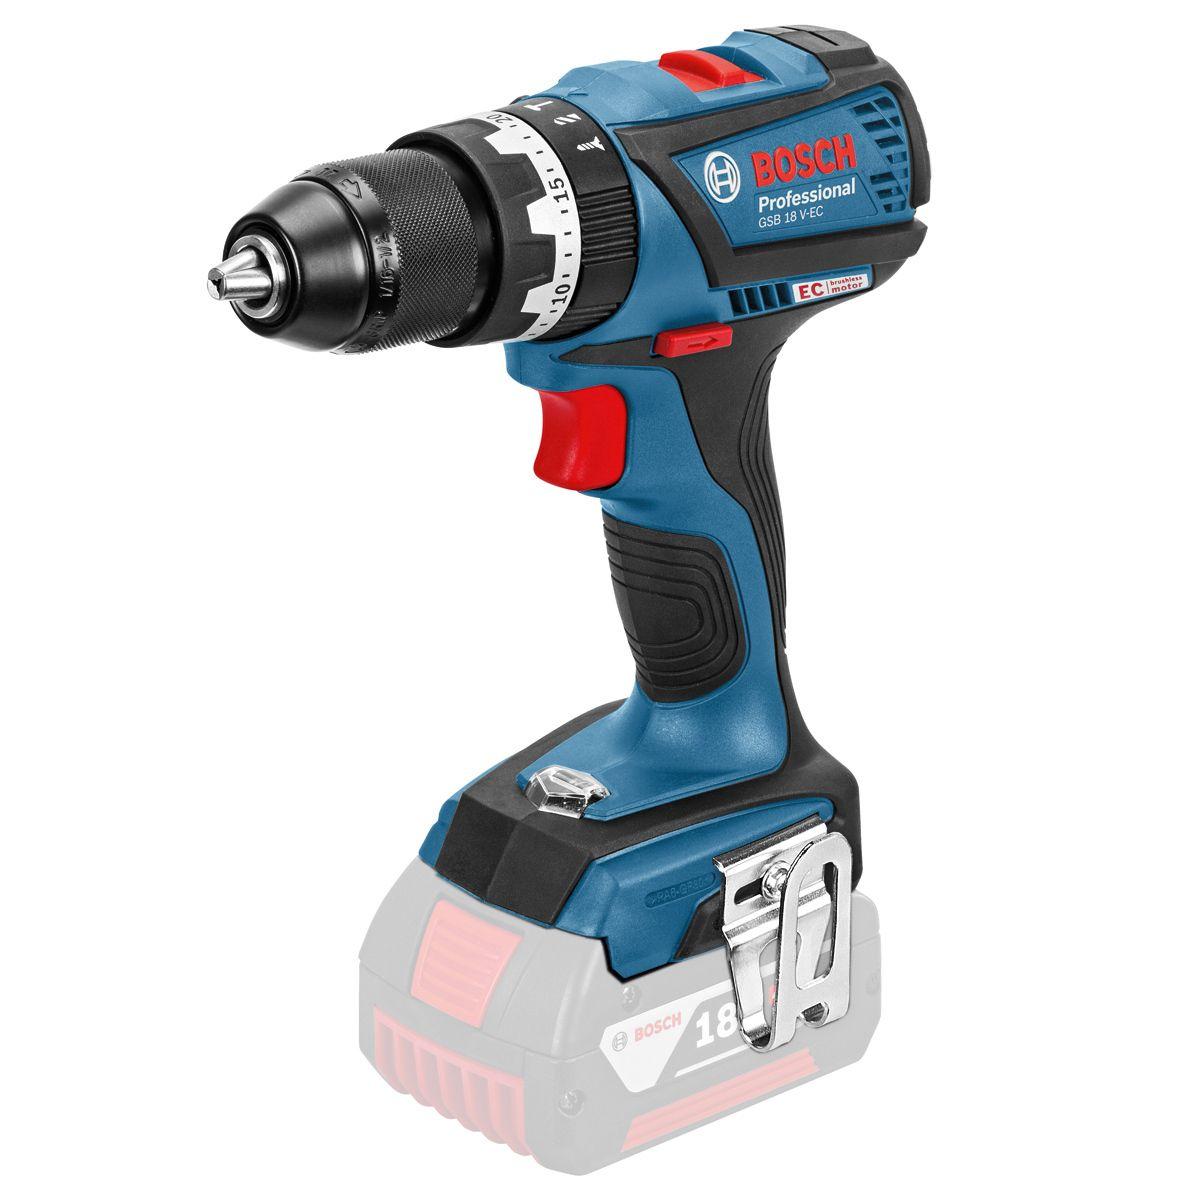 Aku kombinovaný šroubovák Bosch GSB 18 V-EC Professional - bez baterie, 06019E9100